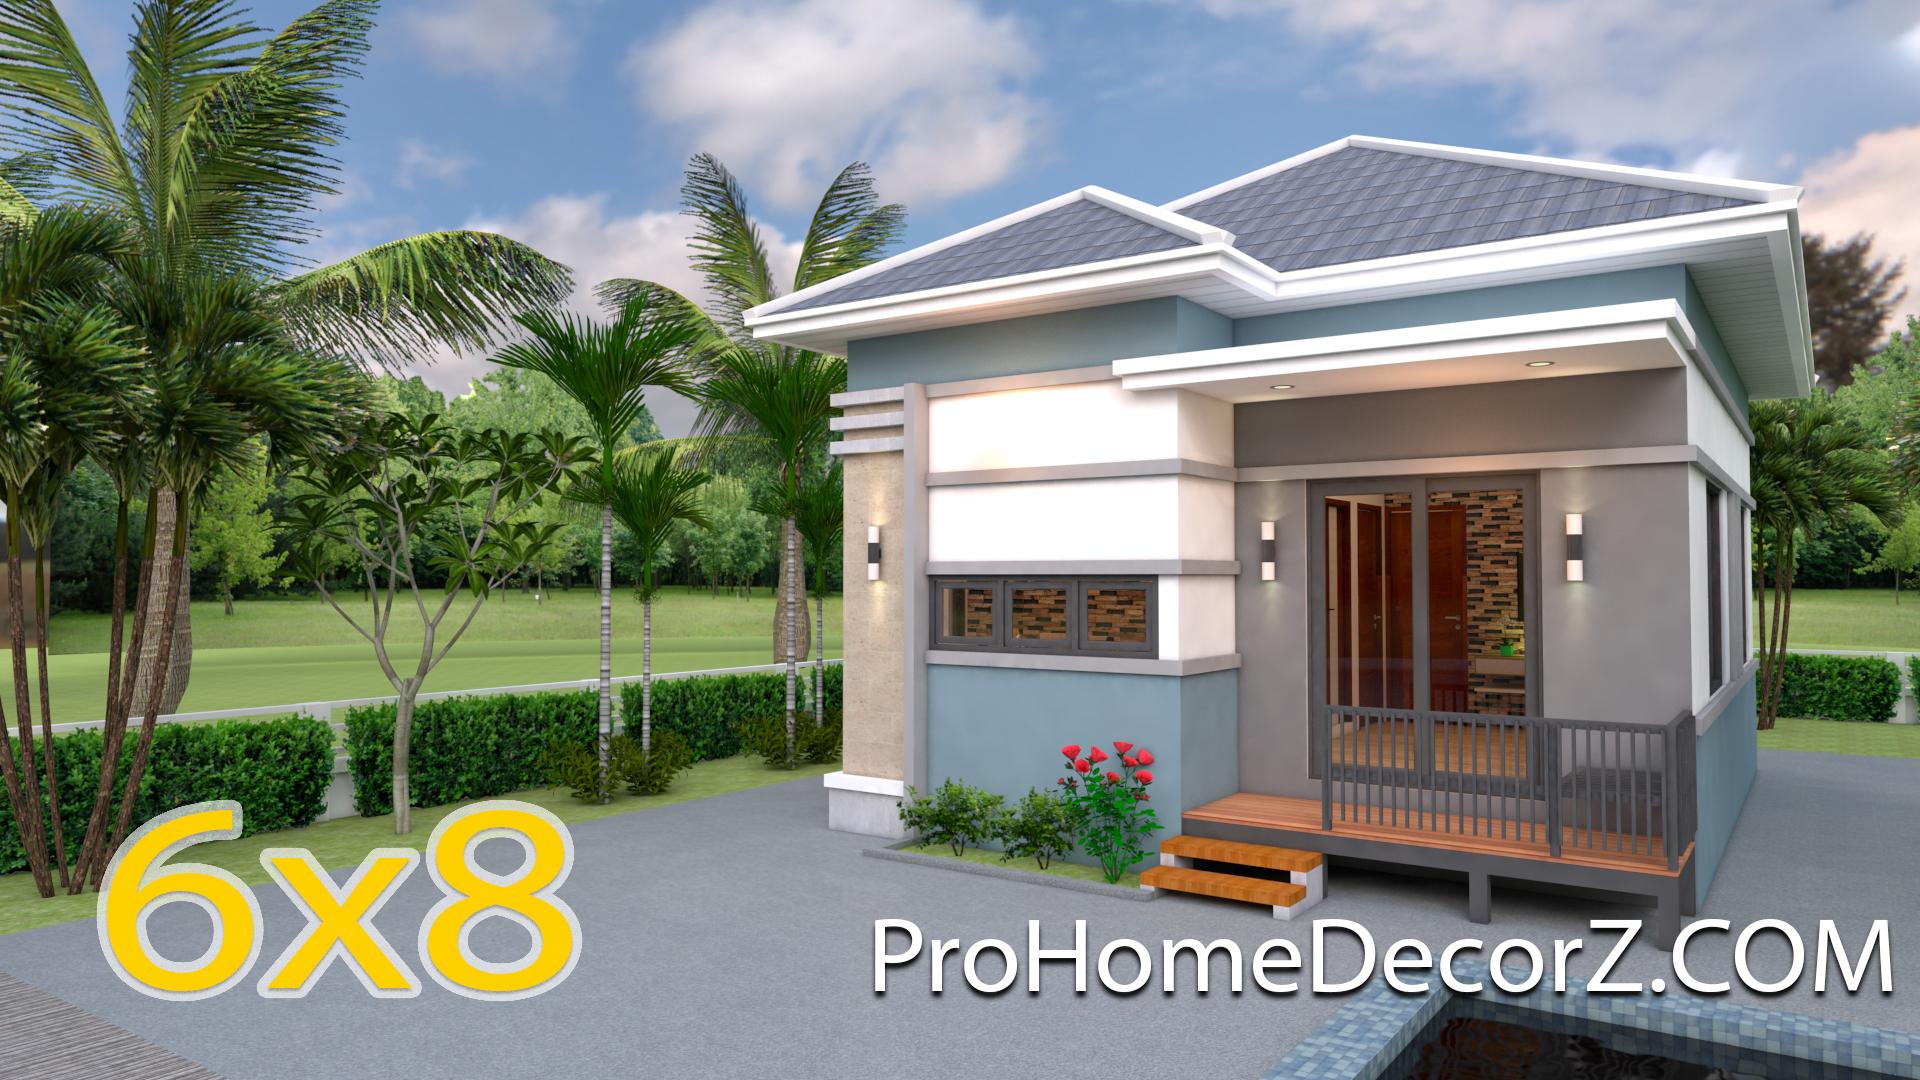 Modern Tiny House 6x8 Meter 20x26 Feet Hip Roof Pro Home Decor Z